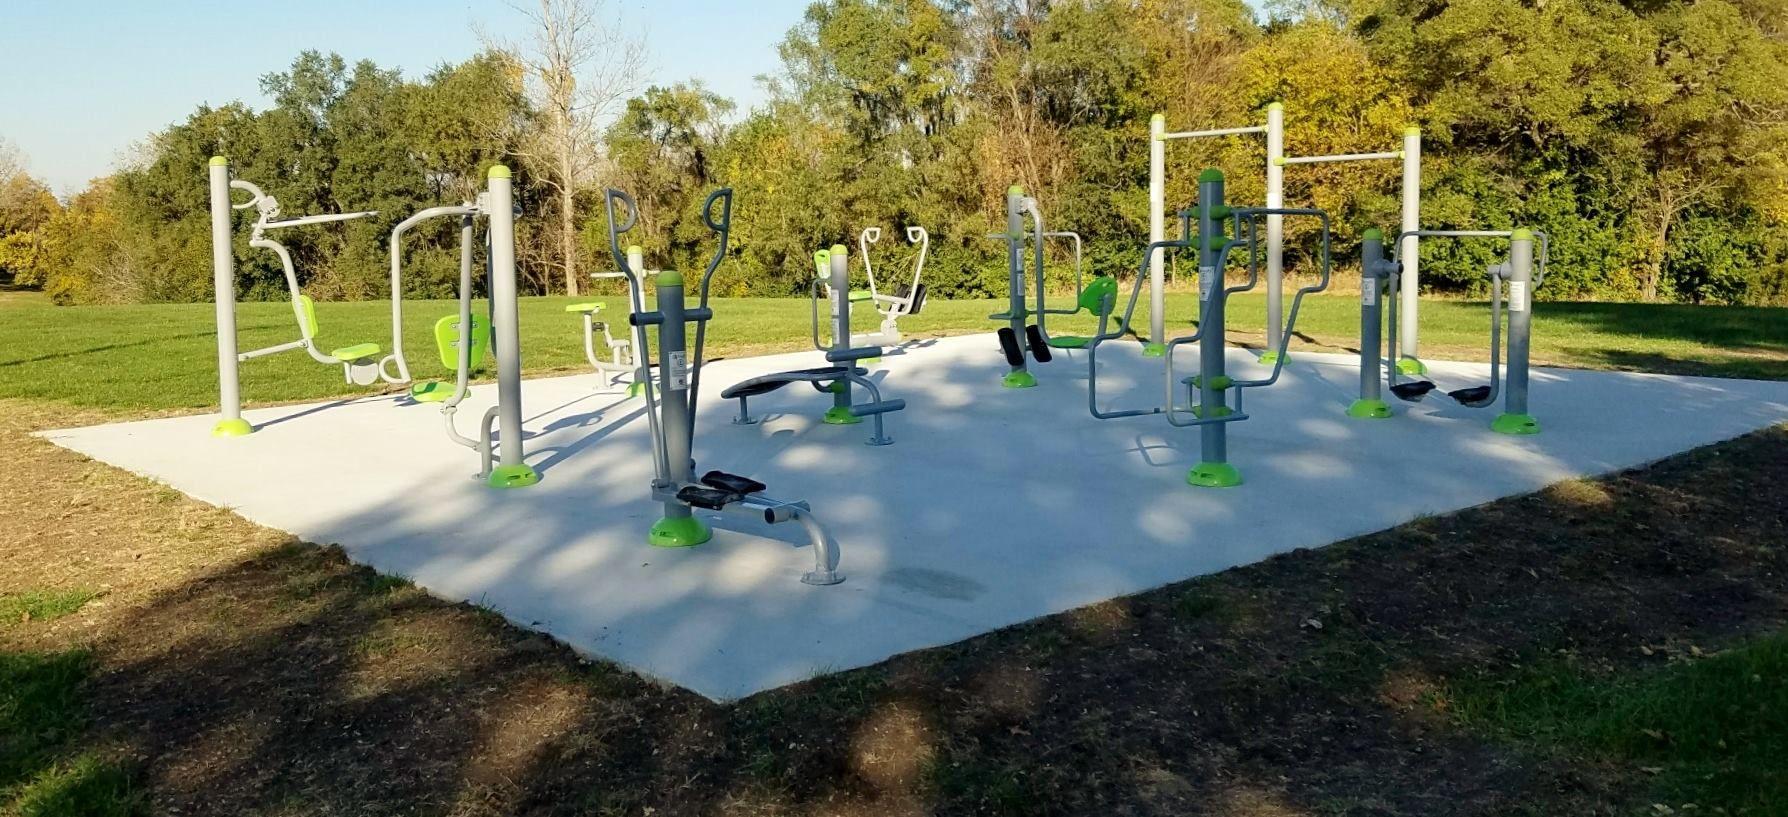 Exofit outdoor fitness park outdoor fitness equipment